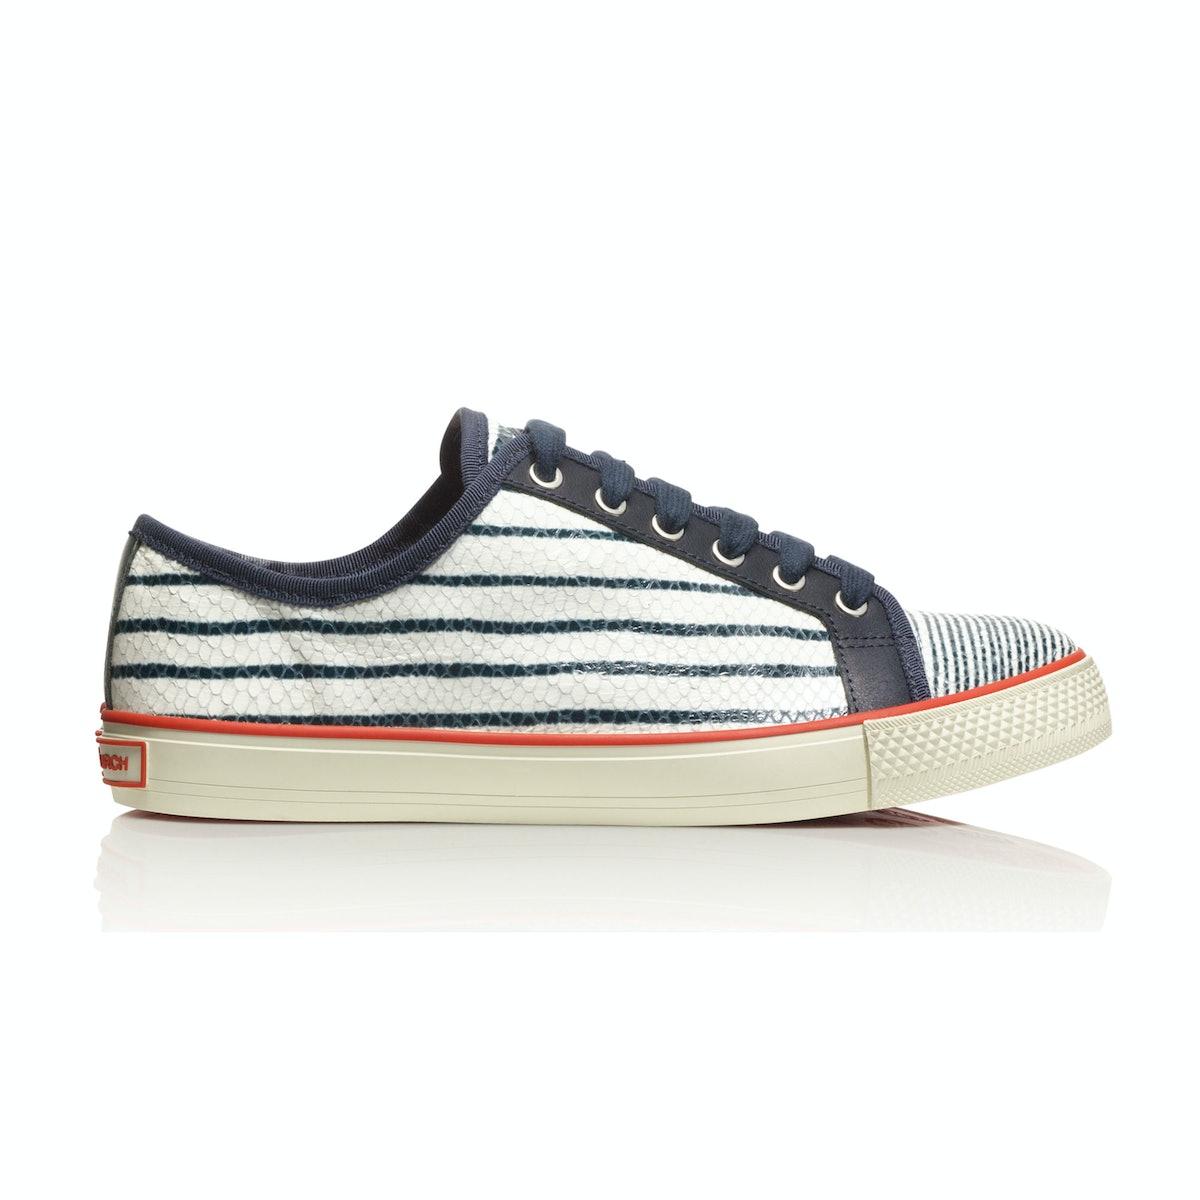 Tory Burch millie sneaker, $195, [toryburch.com](http://www.toryburch.com/millie-sneaker/51138430.ht...